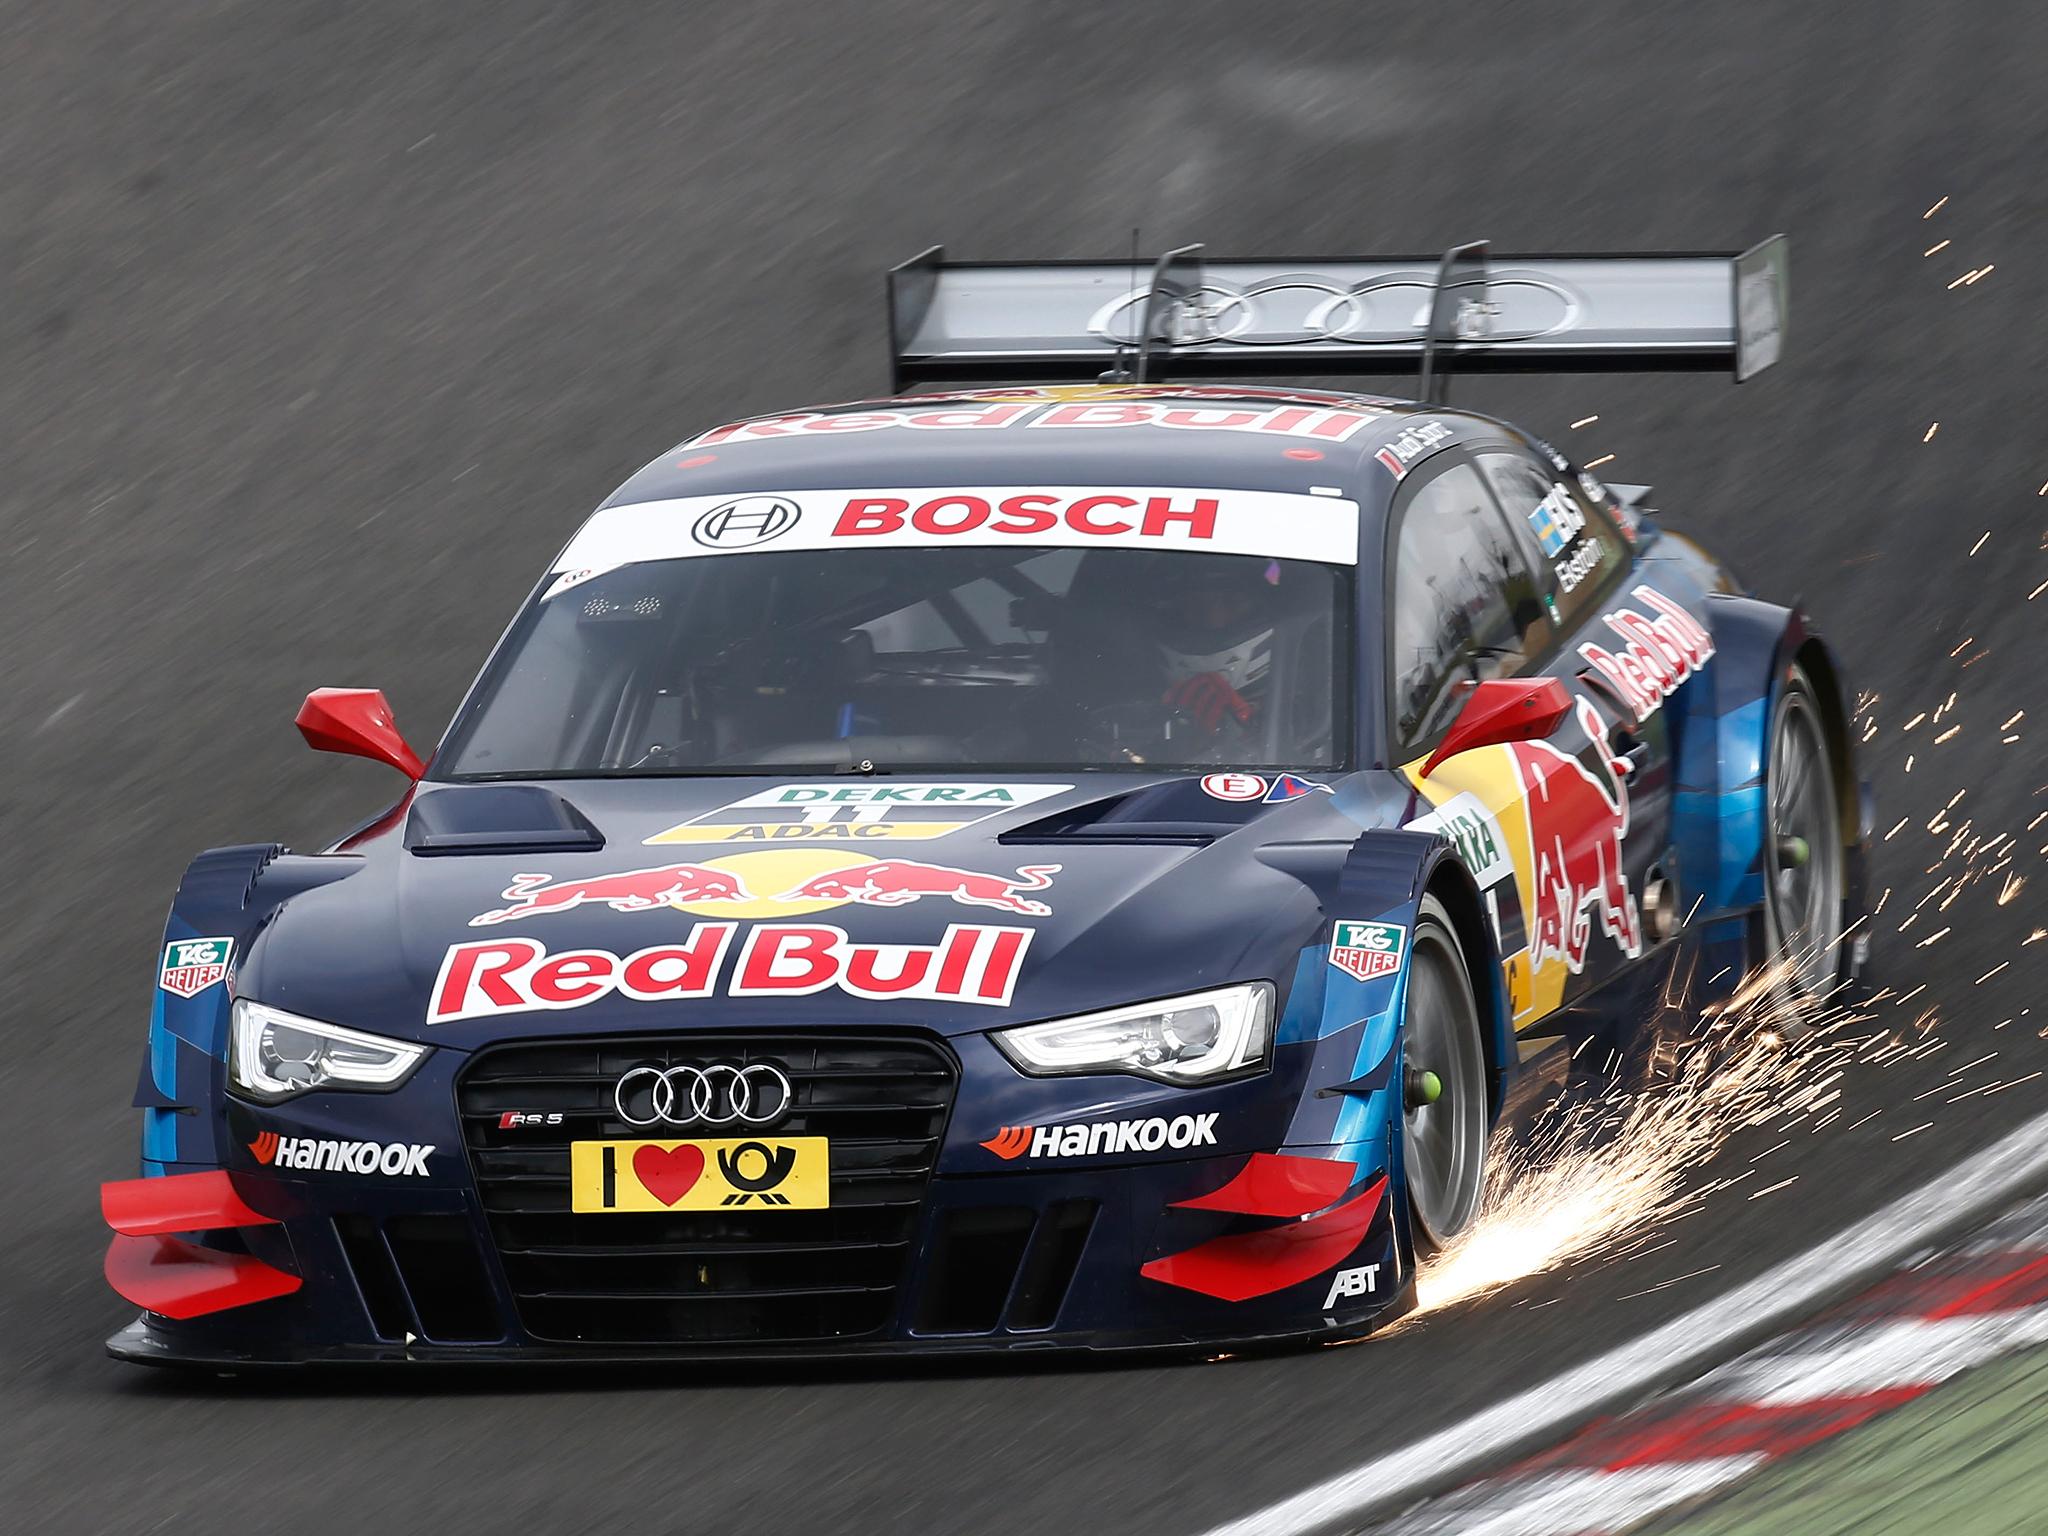 2013 Audi Rs5 Coupe Dtm Race Racing Wallpaper 2048x1536